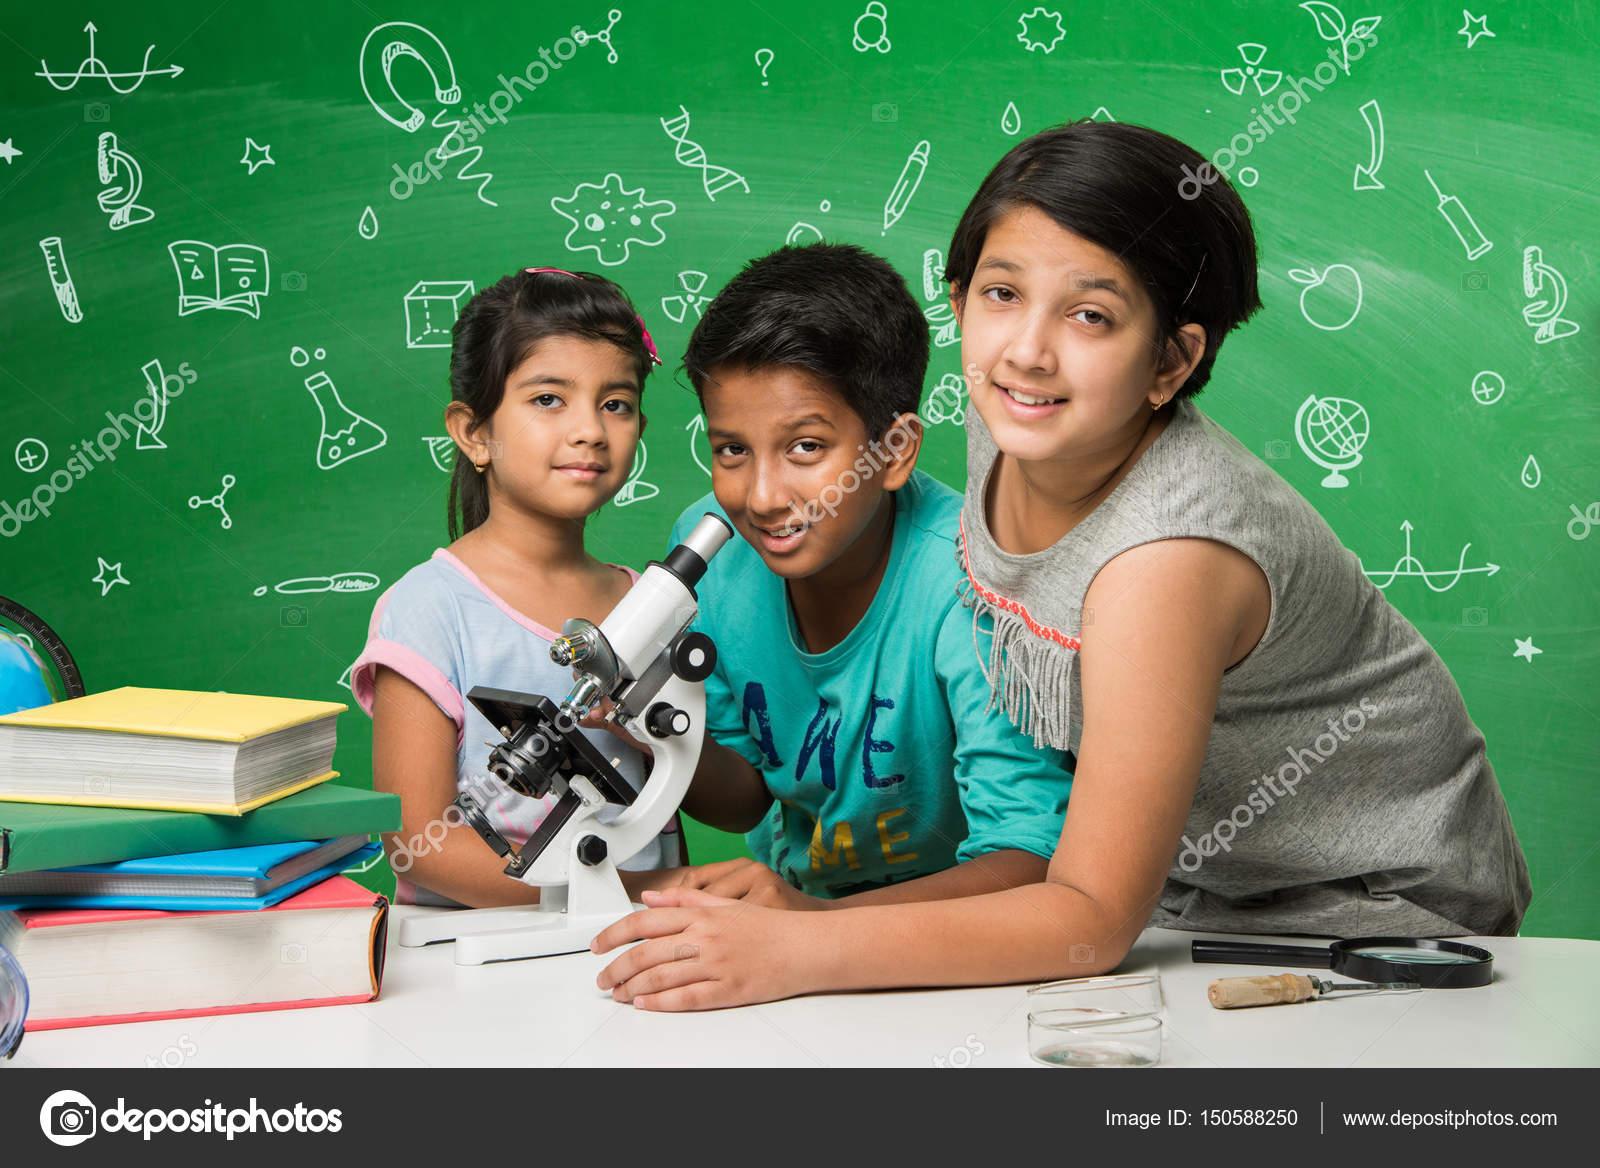 Handy mikroskop hagemann